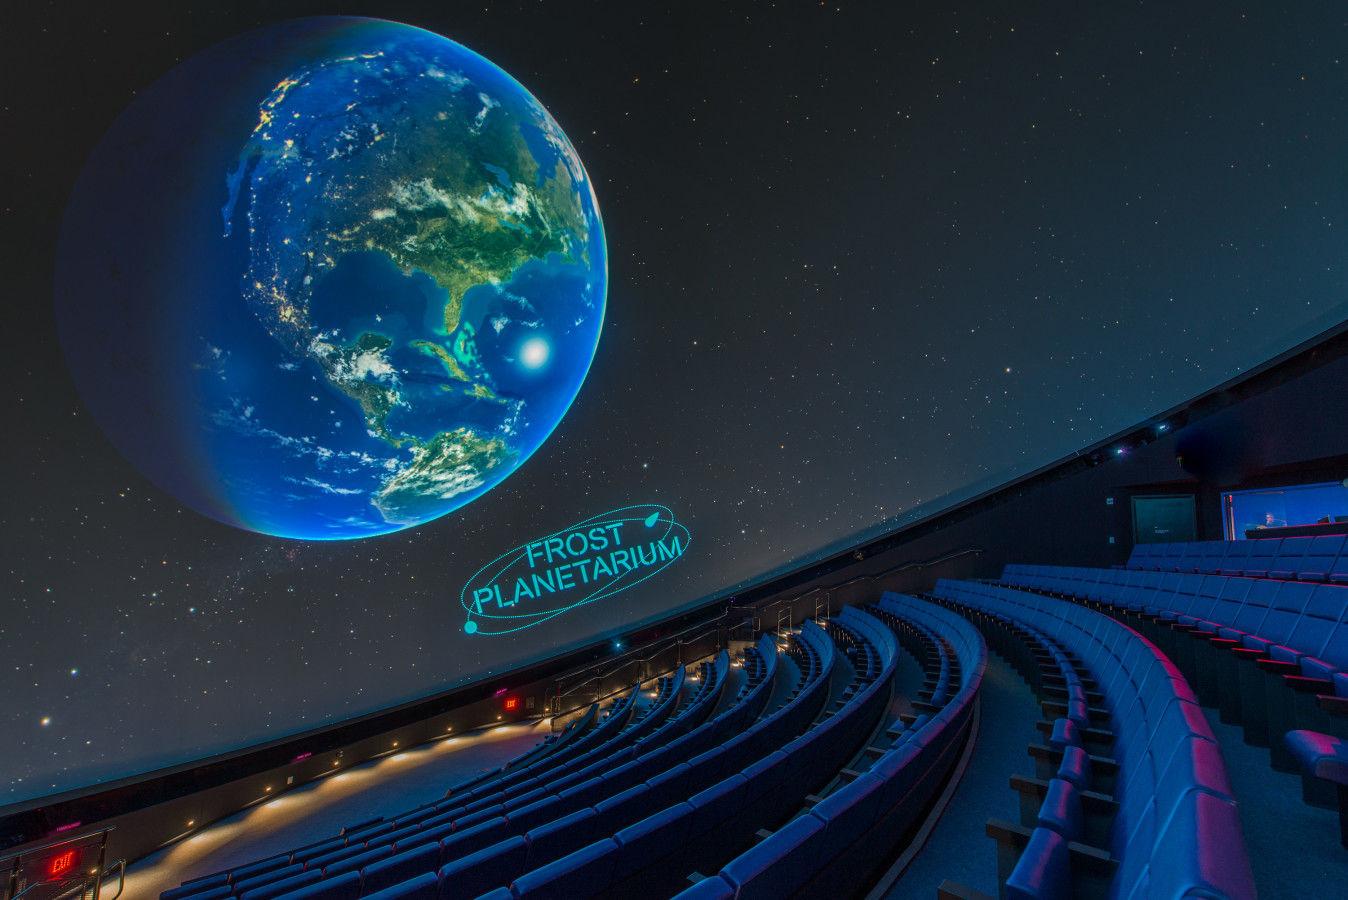 Planetario de escarcha